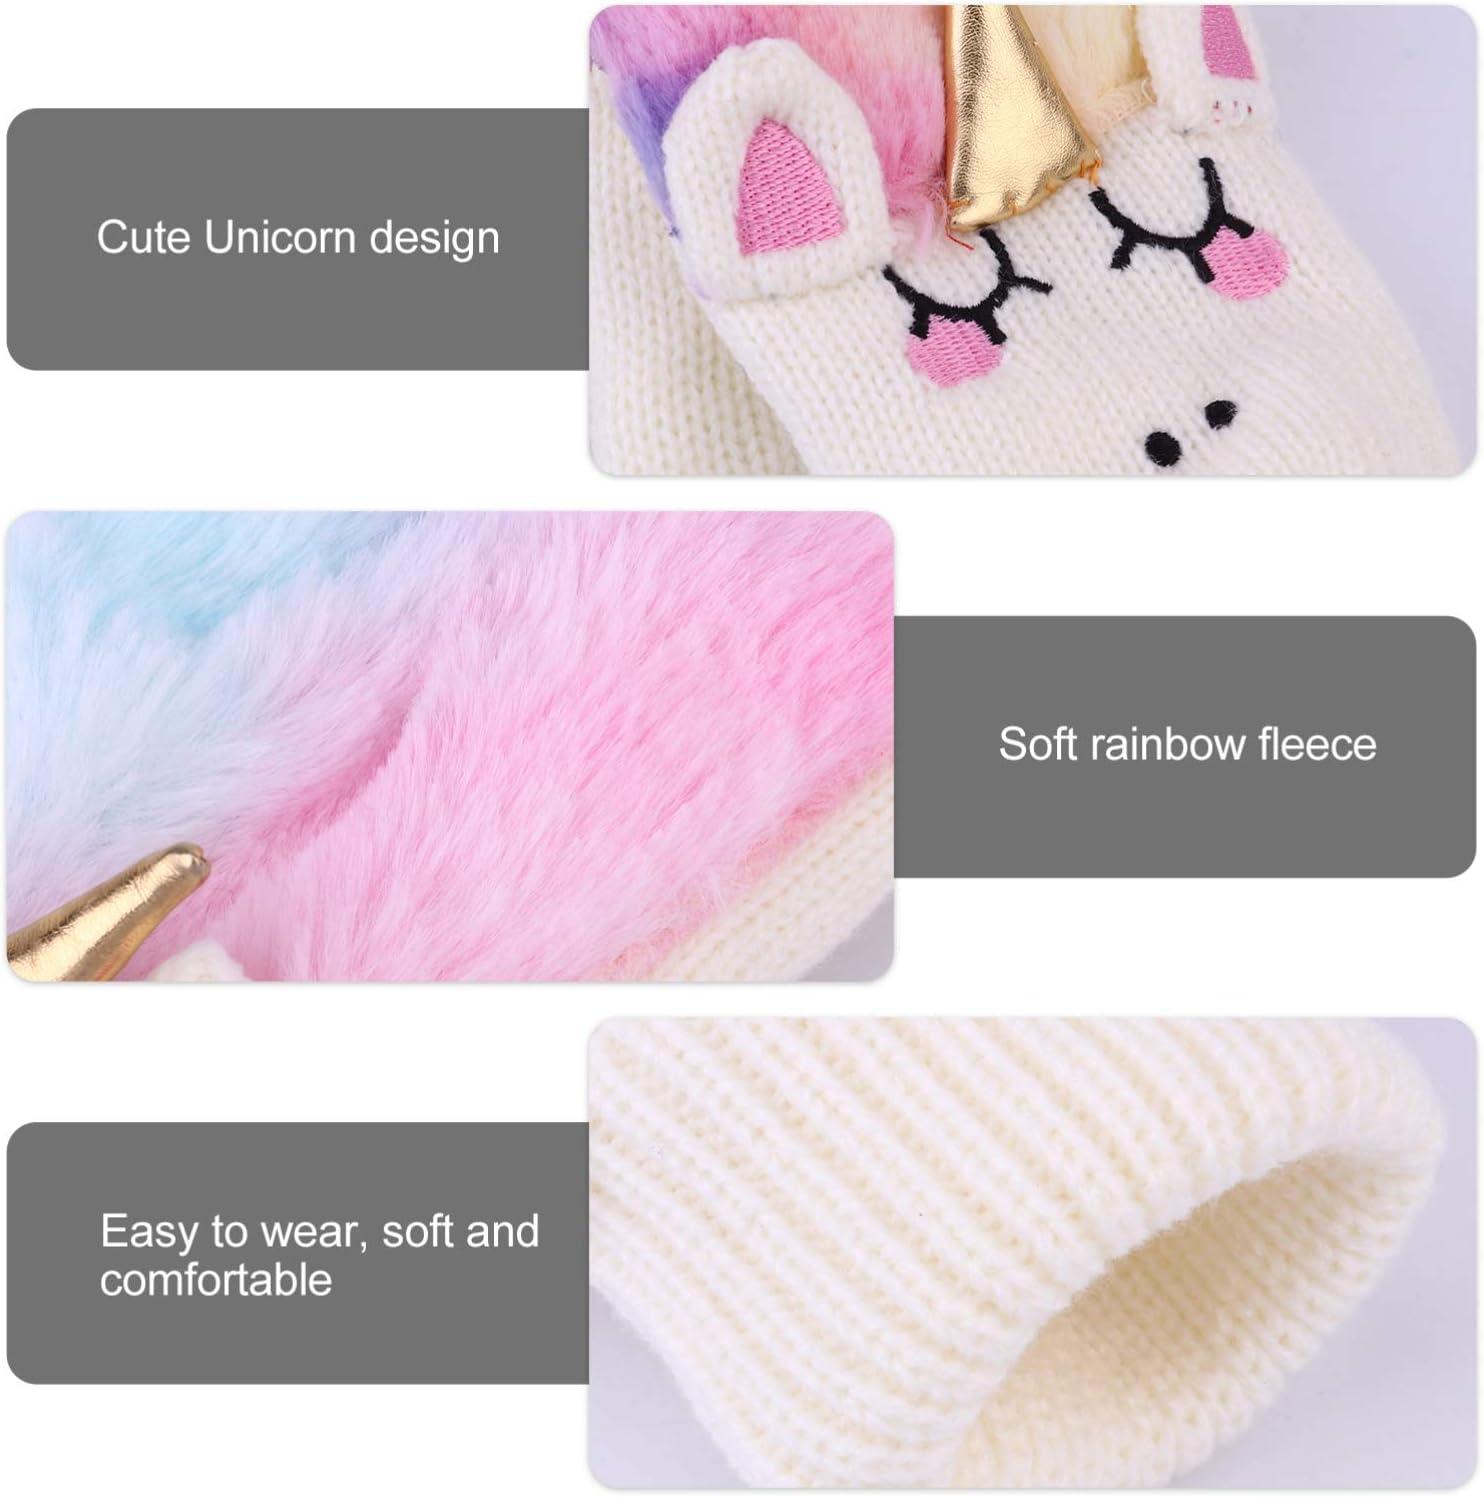 Amosfun 1 Pair Unicorn Glove Mittens Winter Warm Gloves Full Finger Gloves Cozy Knit Faux Fur Mitten Hand Warmer for Girls Women